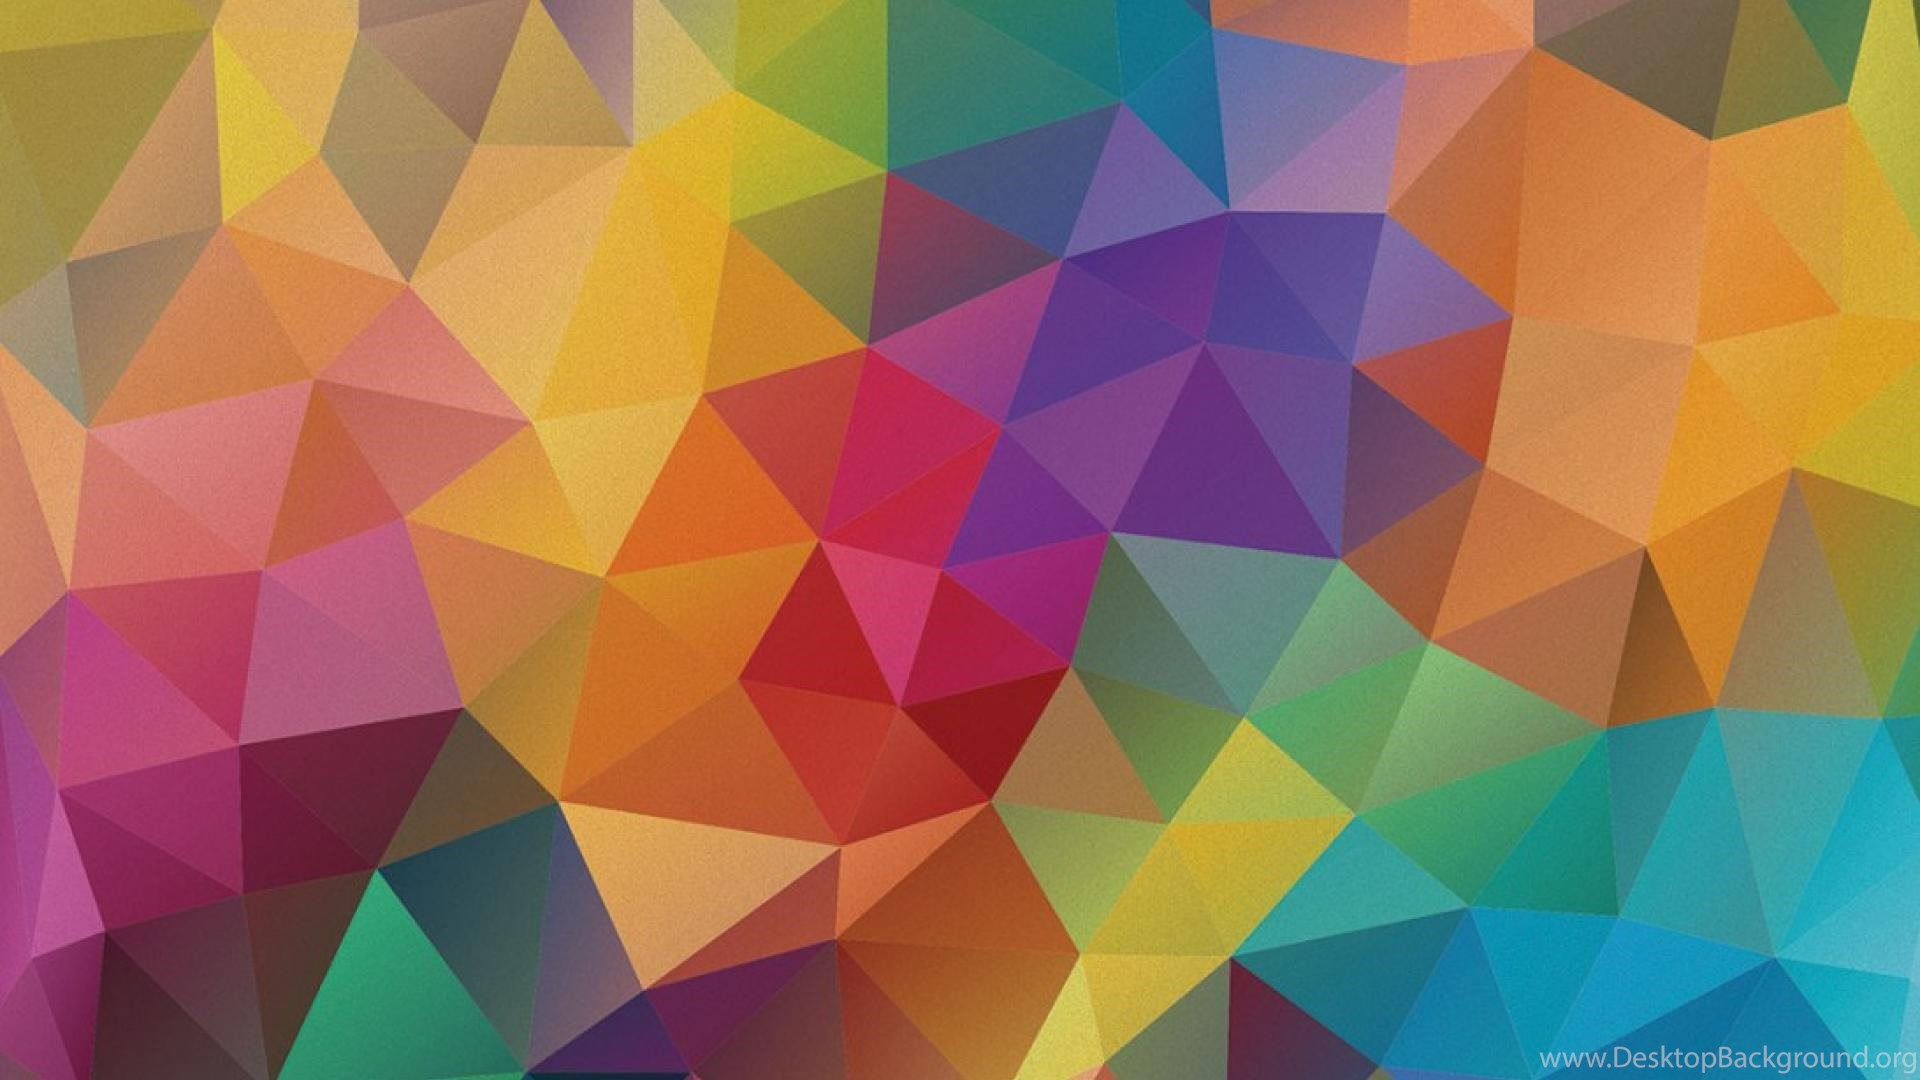 HD Geometric Geometry Design BAckground Wallpapers HiReWallpapers